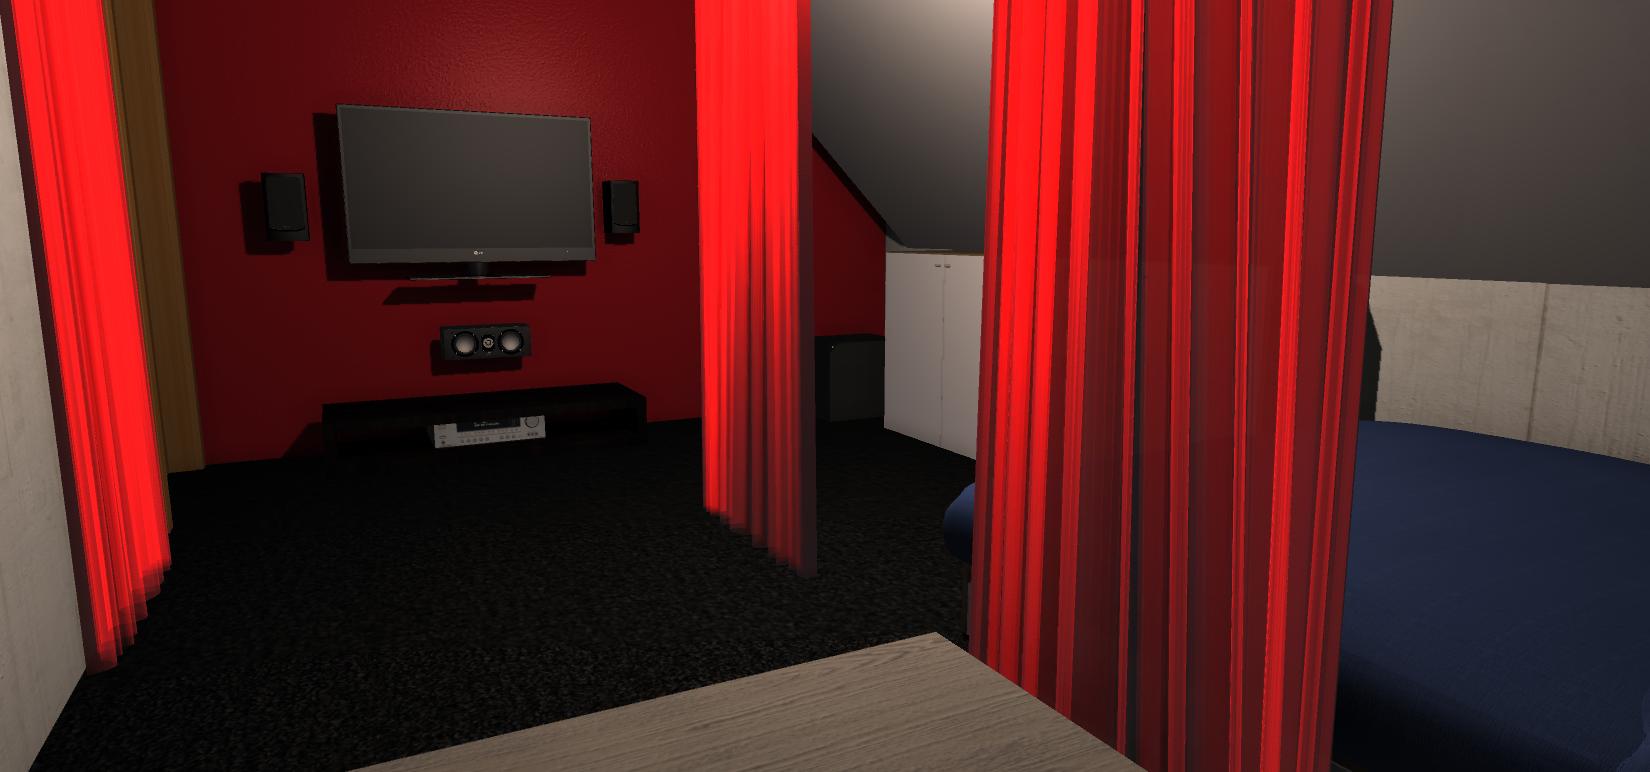 heimkino akustik w nde v rias id ias de. Black Bedroom Furniture Sets. Home Design Ideas